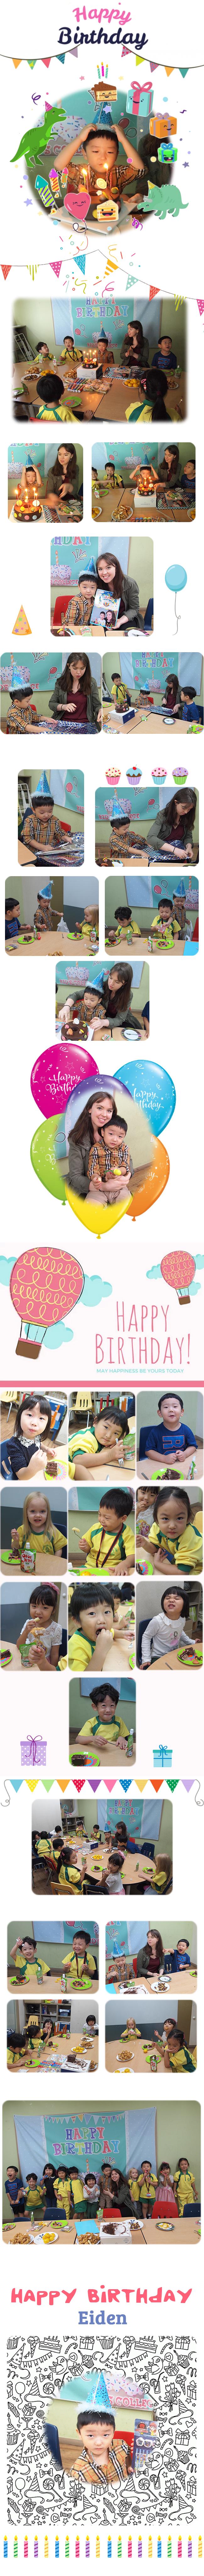 Birthday_Eiden.jpg